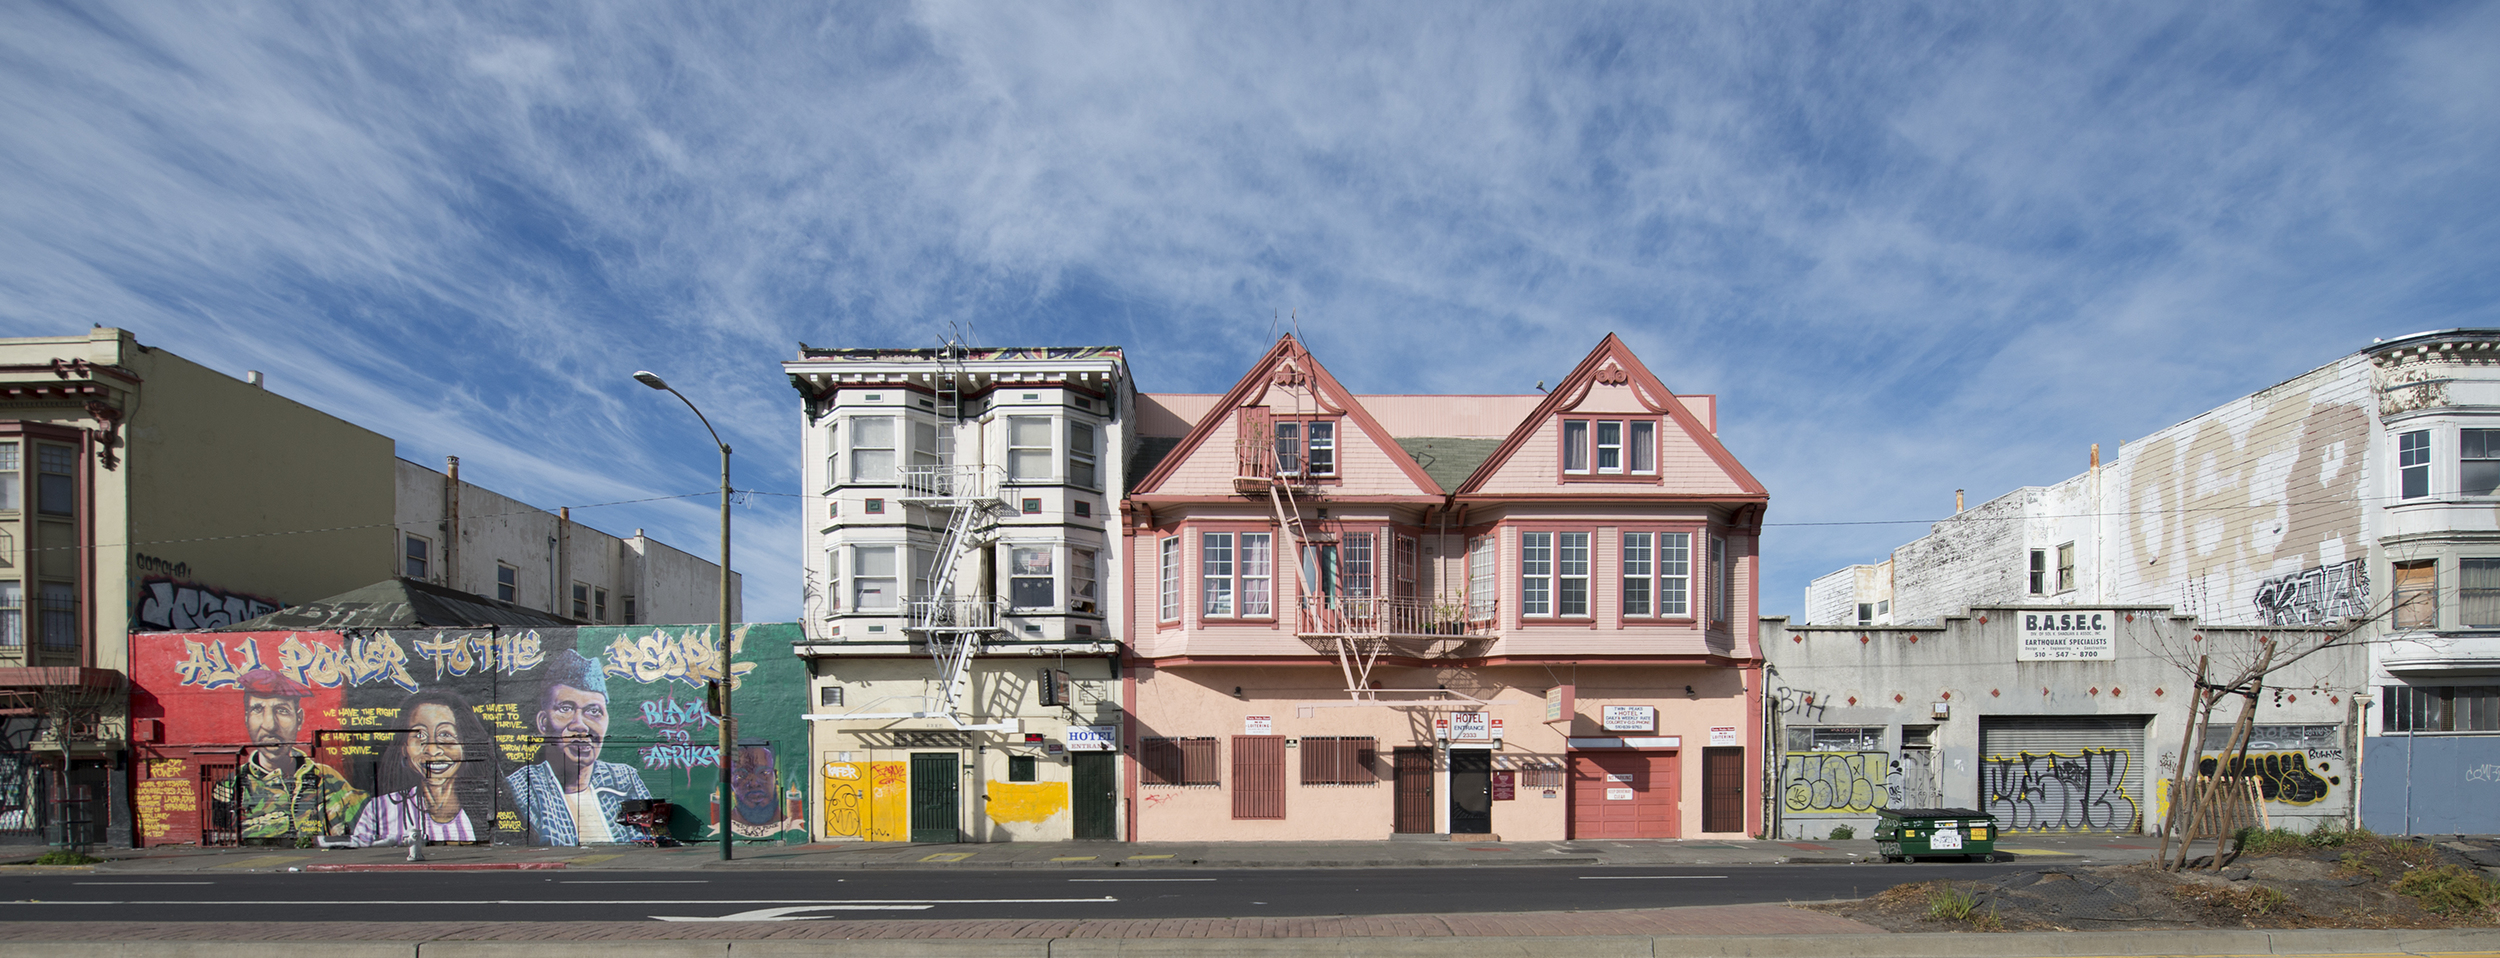 Twin Pinks Hotel.jpg